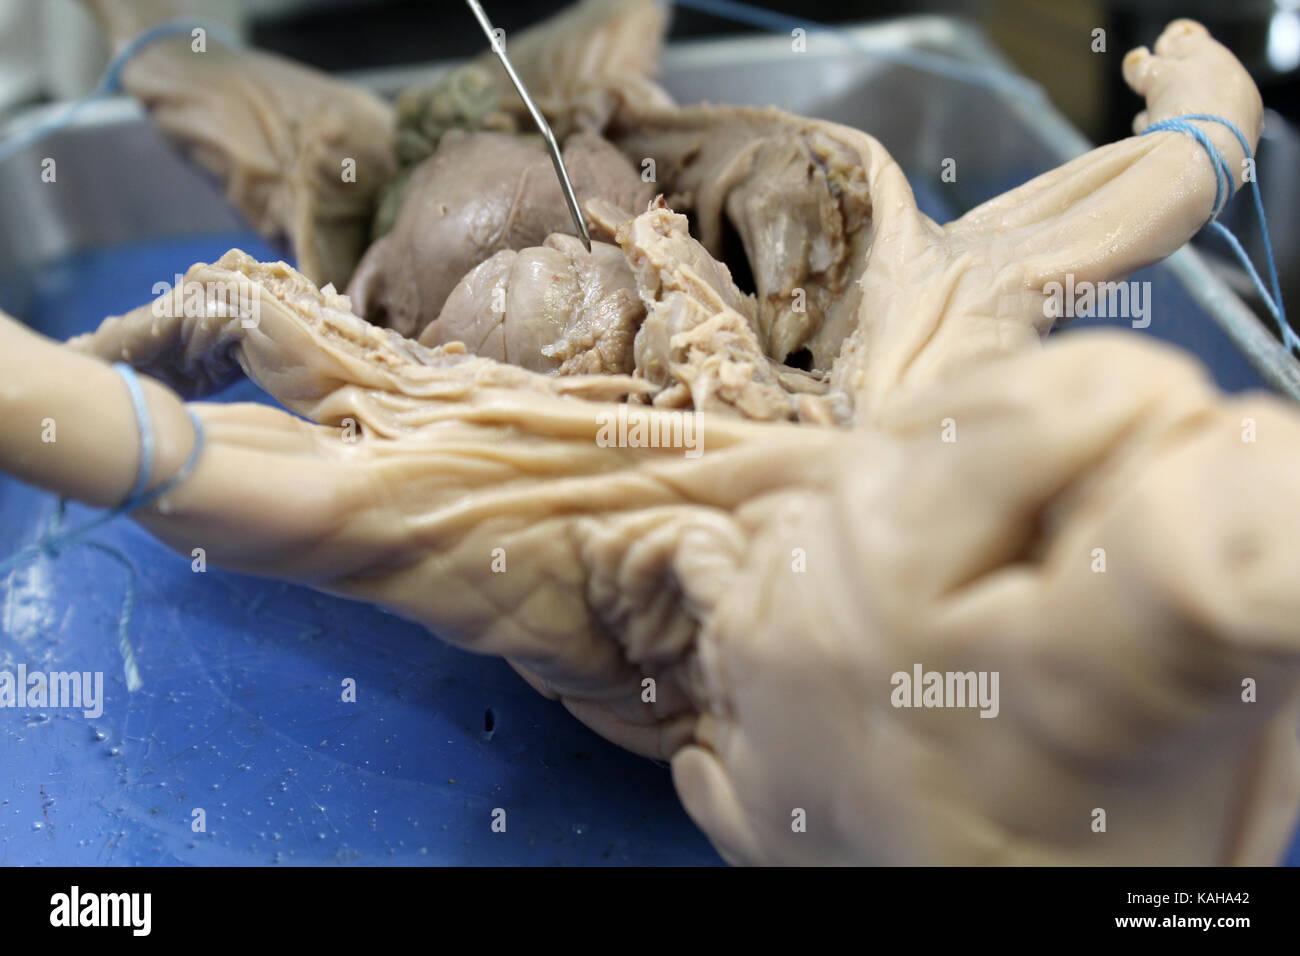 Fetal Pig Stockfotos & Fetal Pig Bilder - Alamy